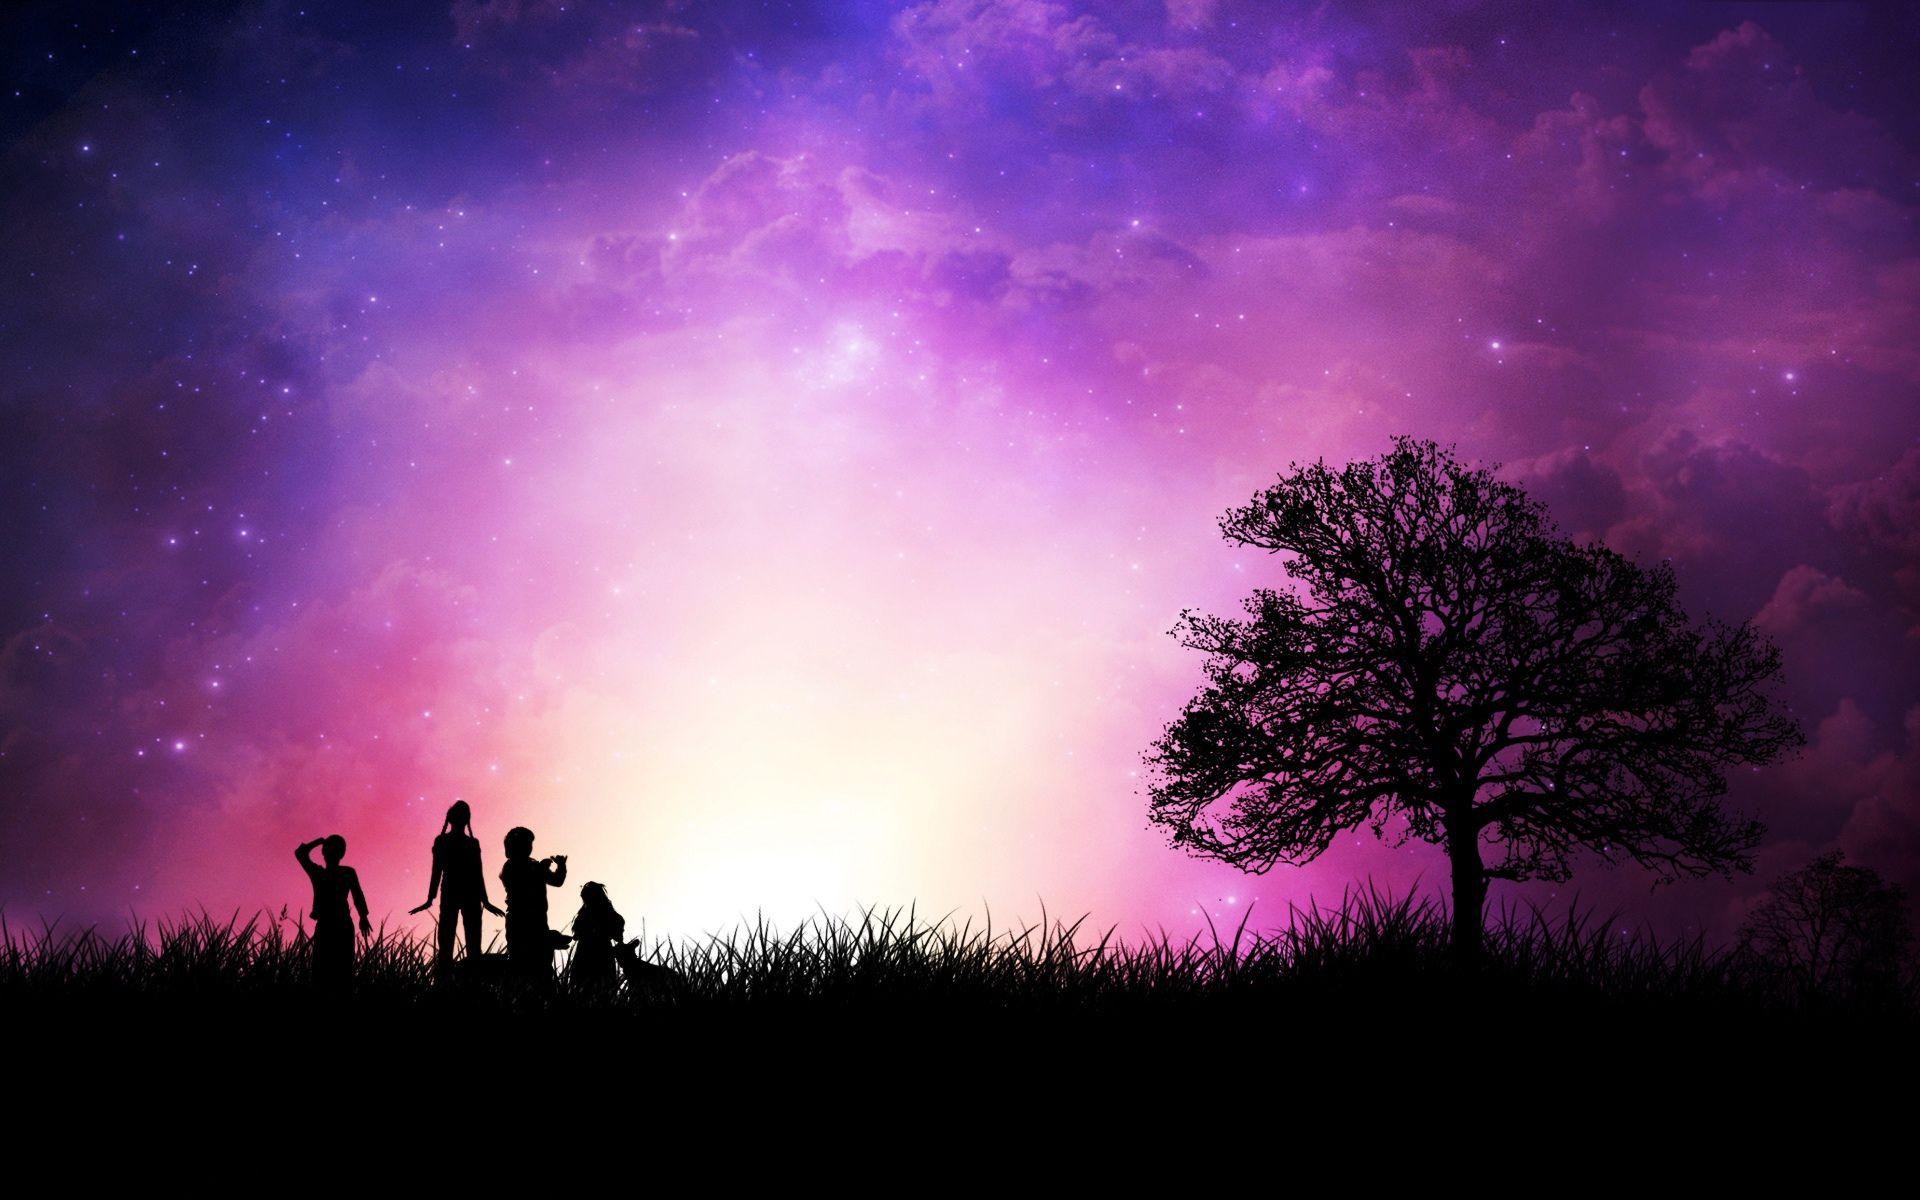 Chilling Purple Sunset Purple Background Images Sunset Wallpaper Background Images